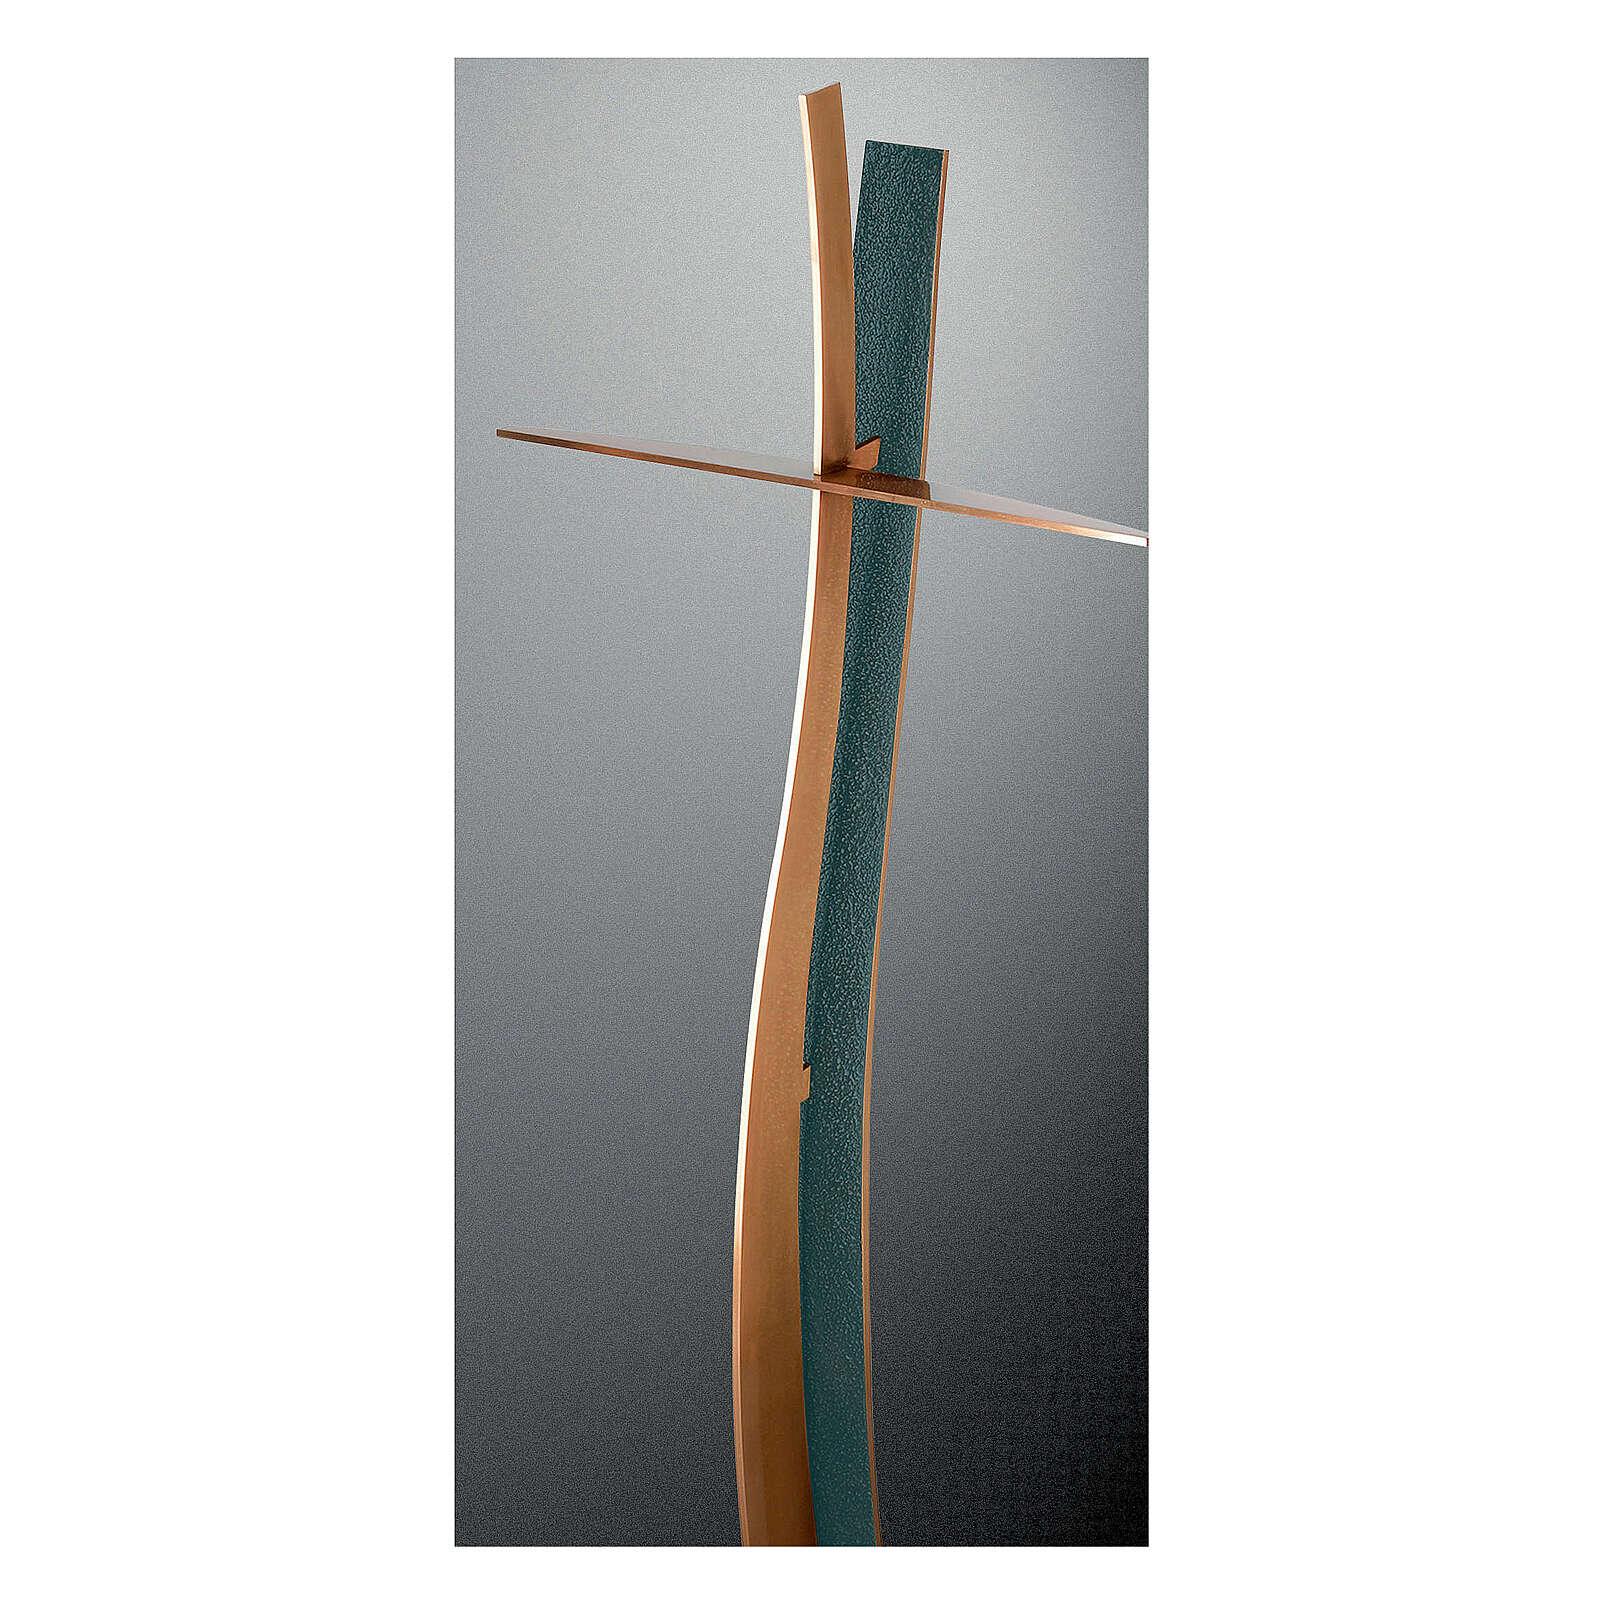 Croce ondulata bronzo finitura FOLK 90 cm per ESTERNO 3